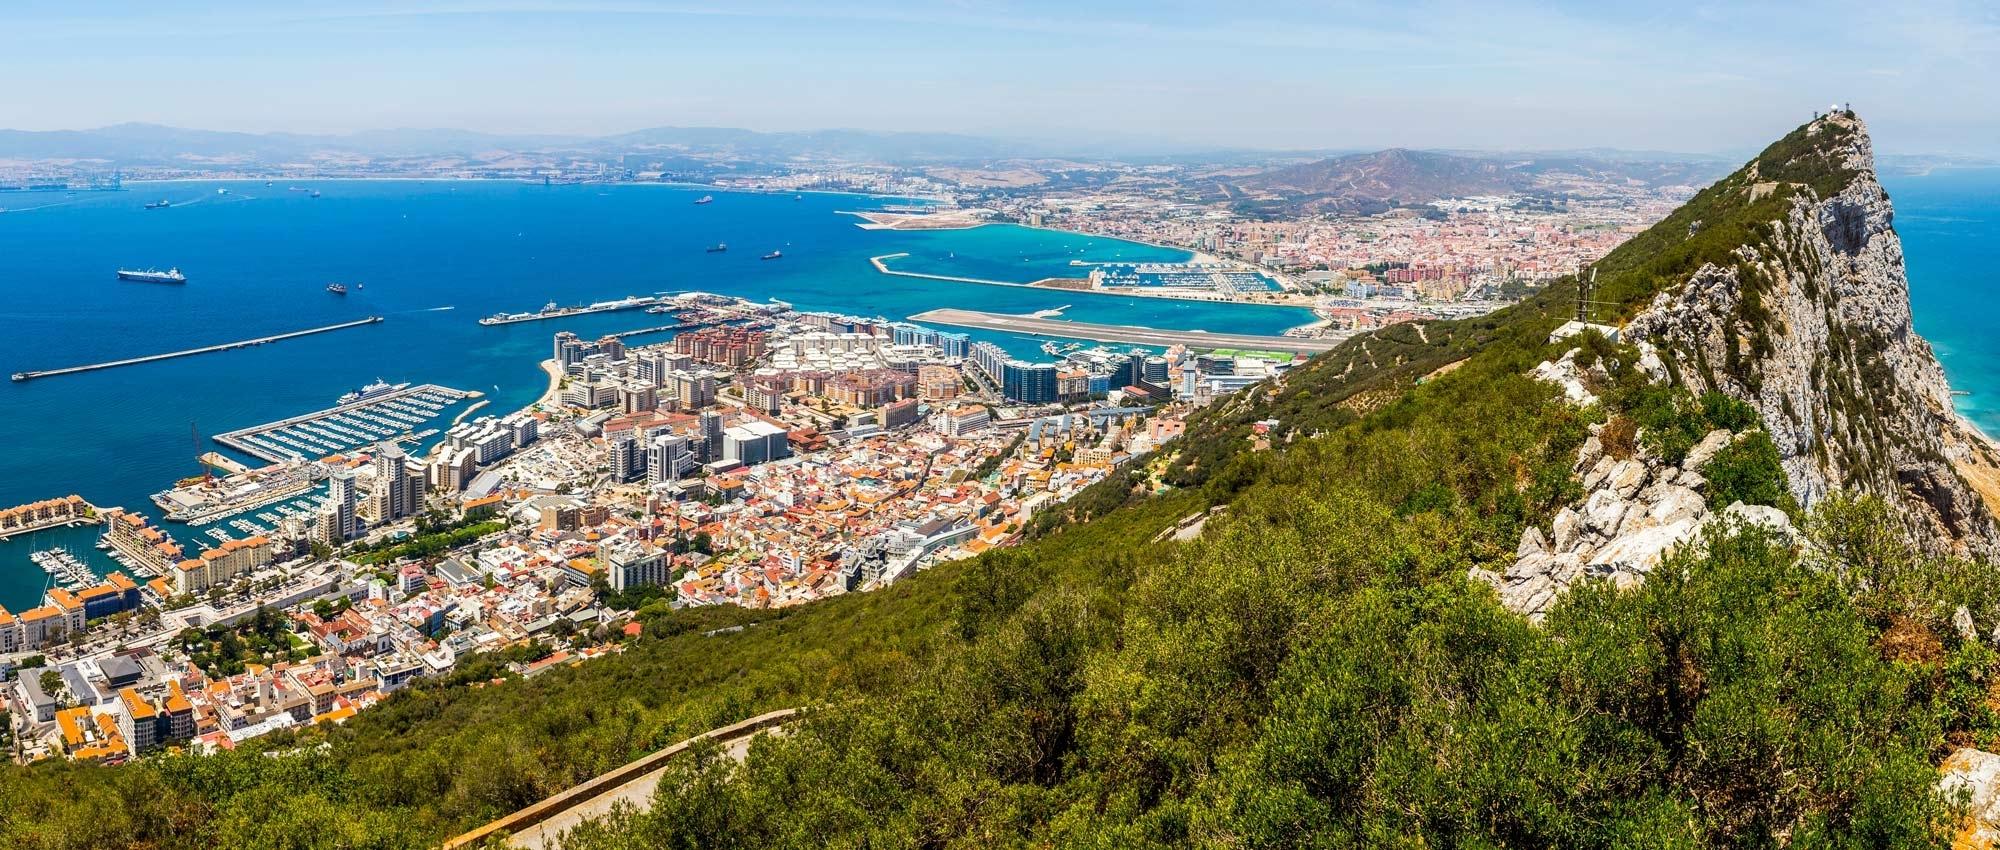 Noleggio Volkswagen a Gibilterra